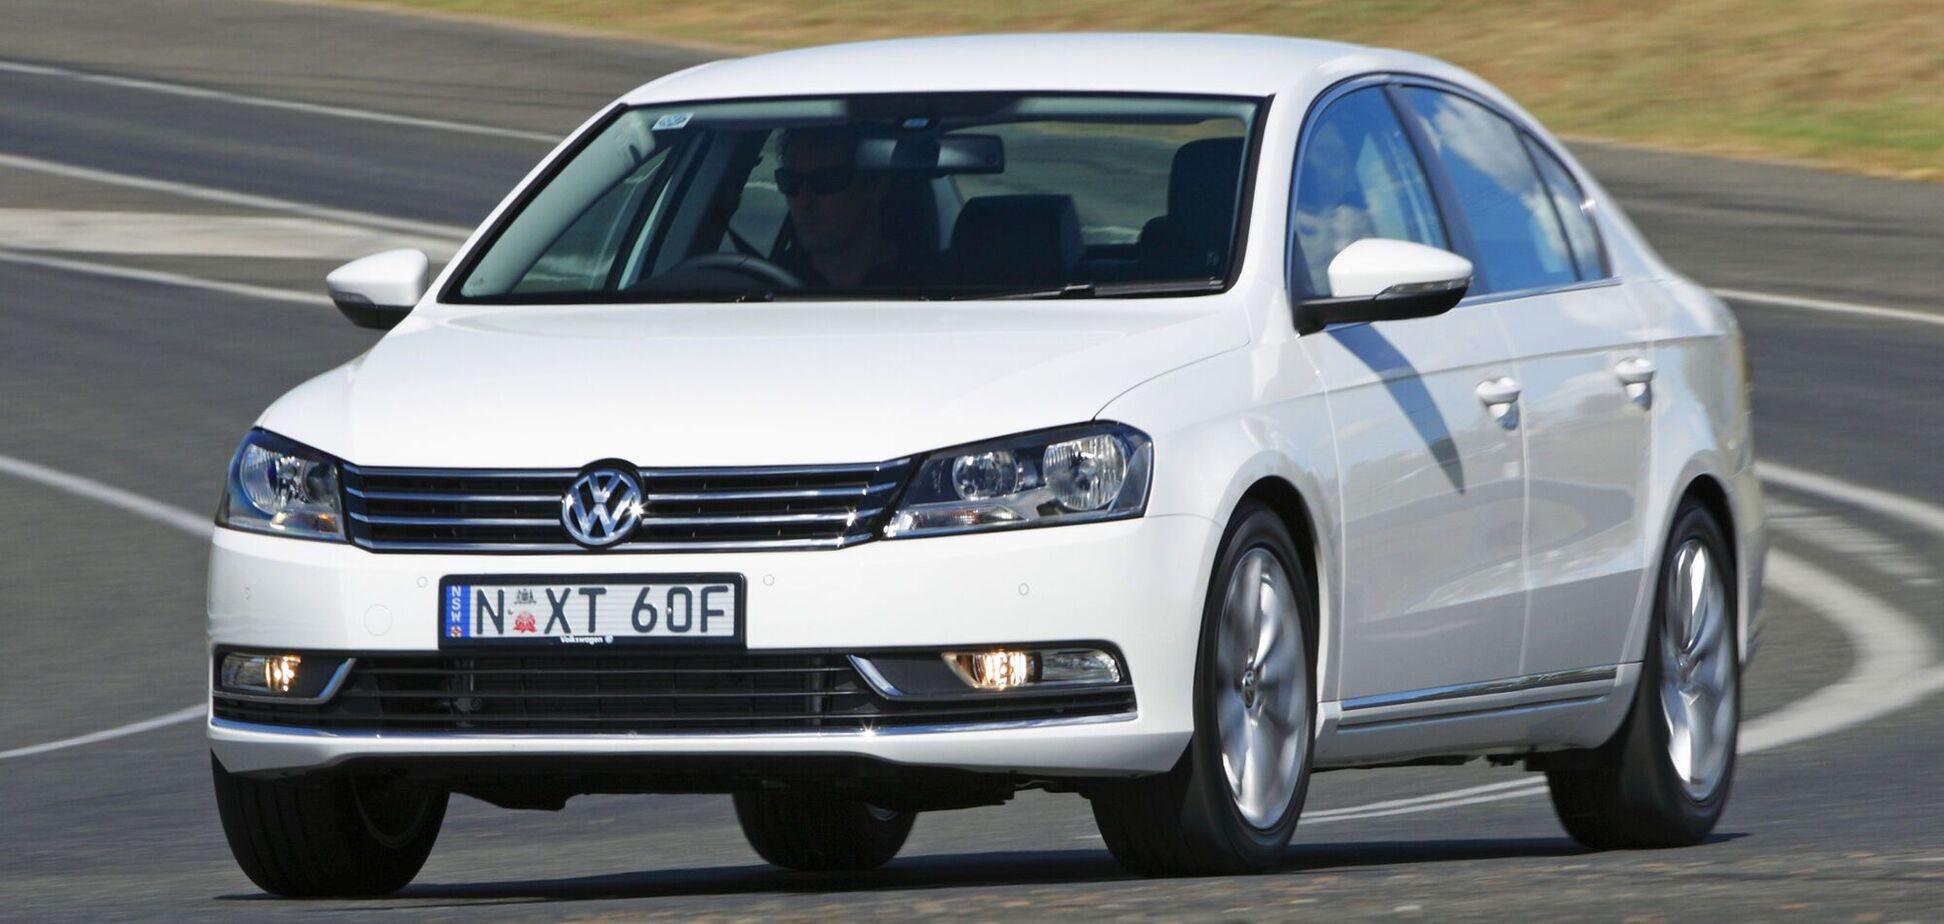 Названо бестселери українського ринку вживаних авто в червні